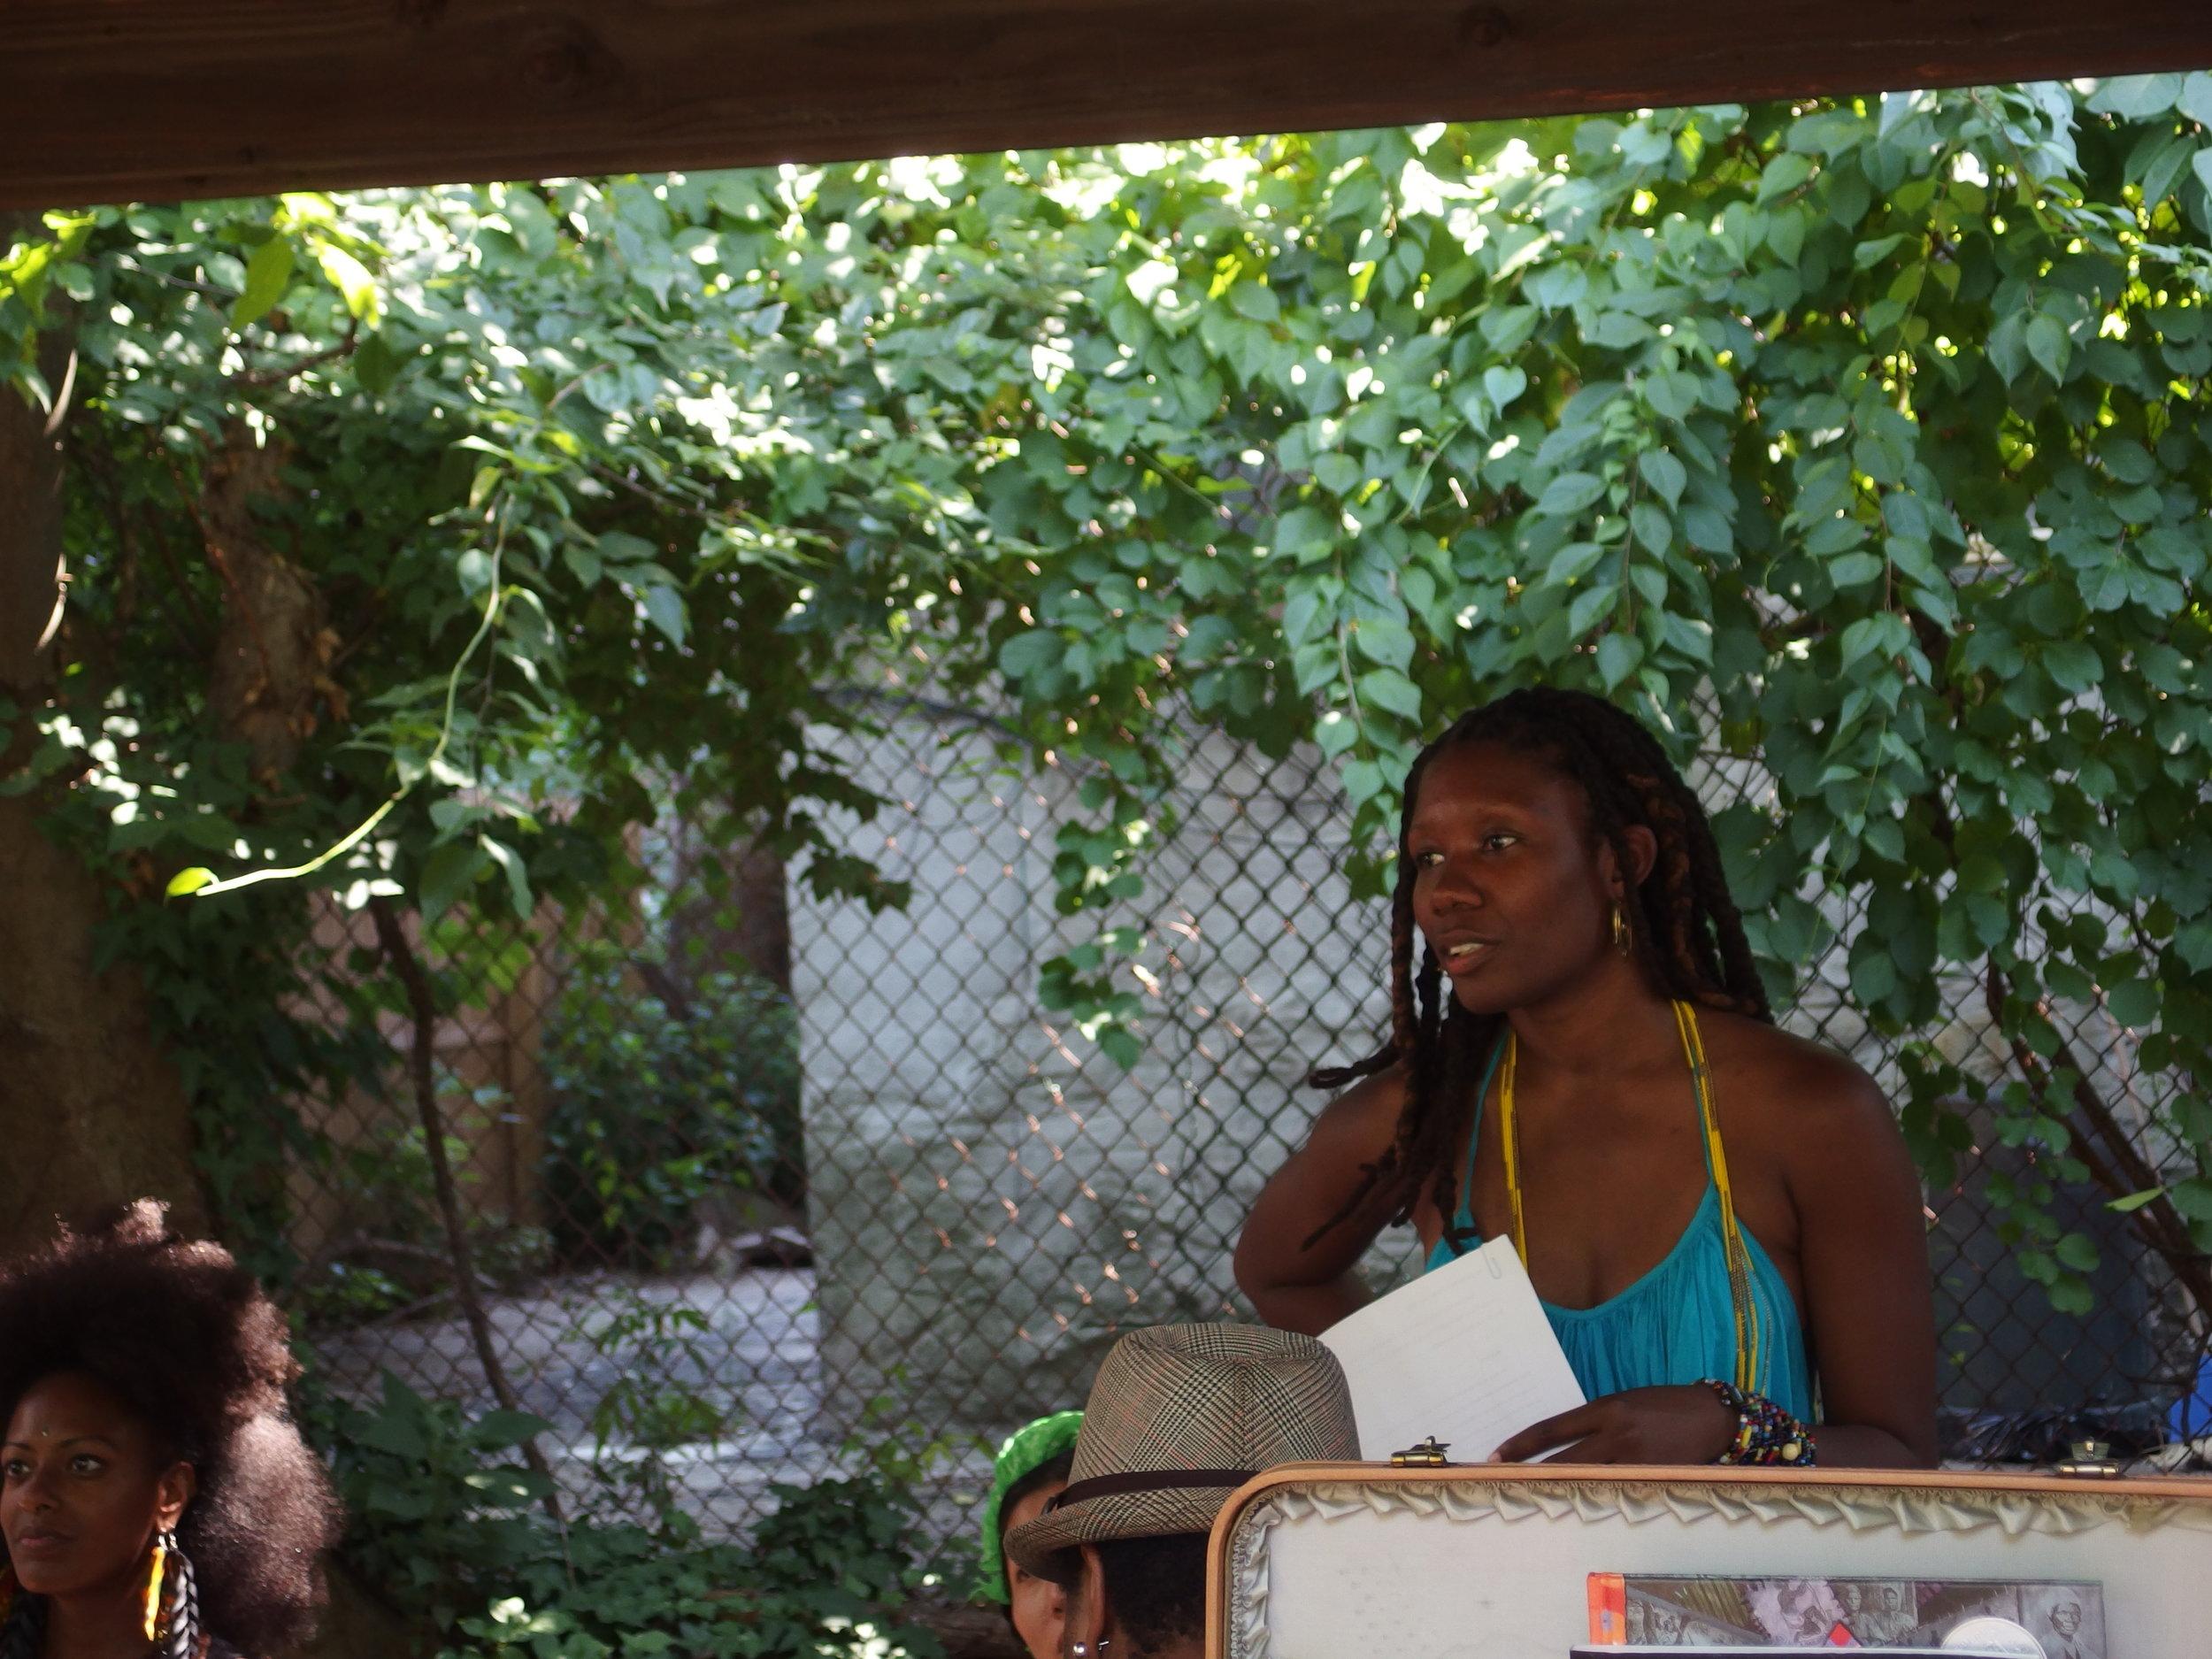 little-free-black-womens-library_20951117675_o.jpg